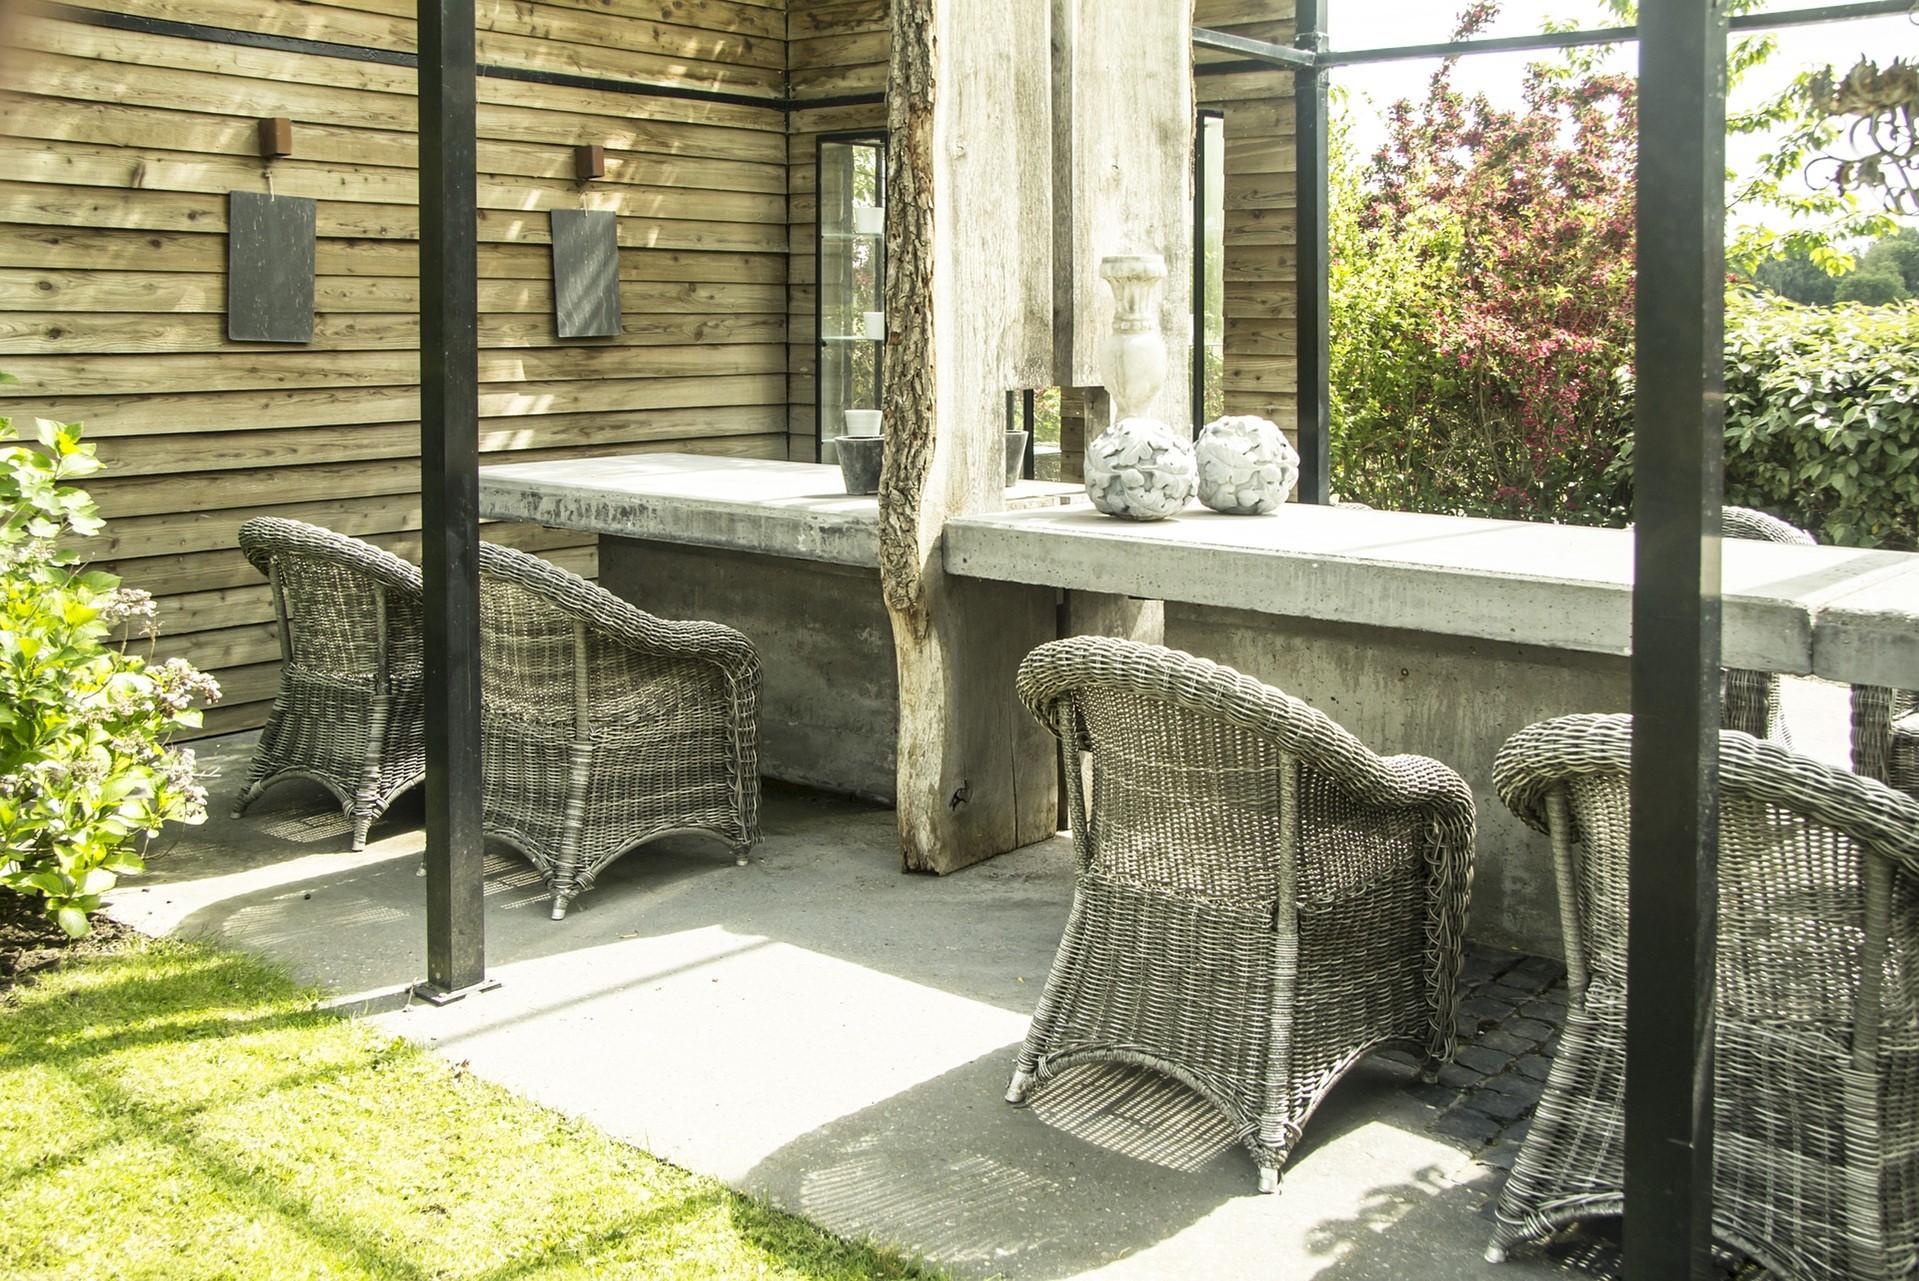 Garden Ideas That Are Low Maintenance